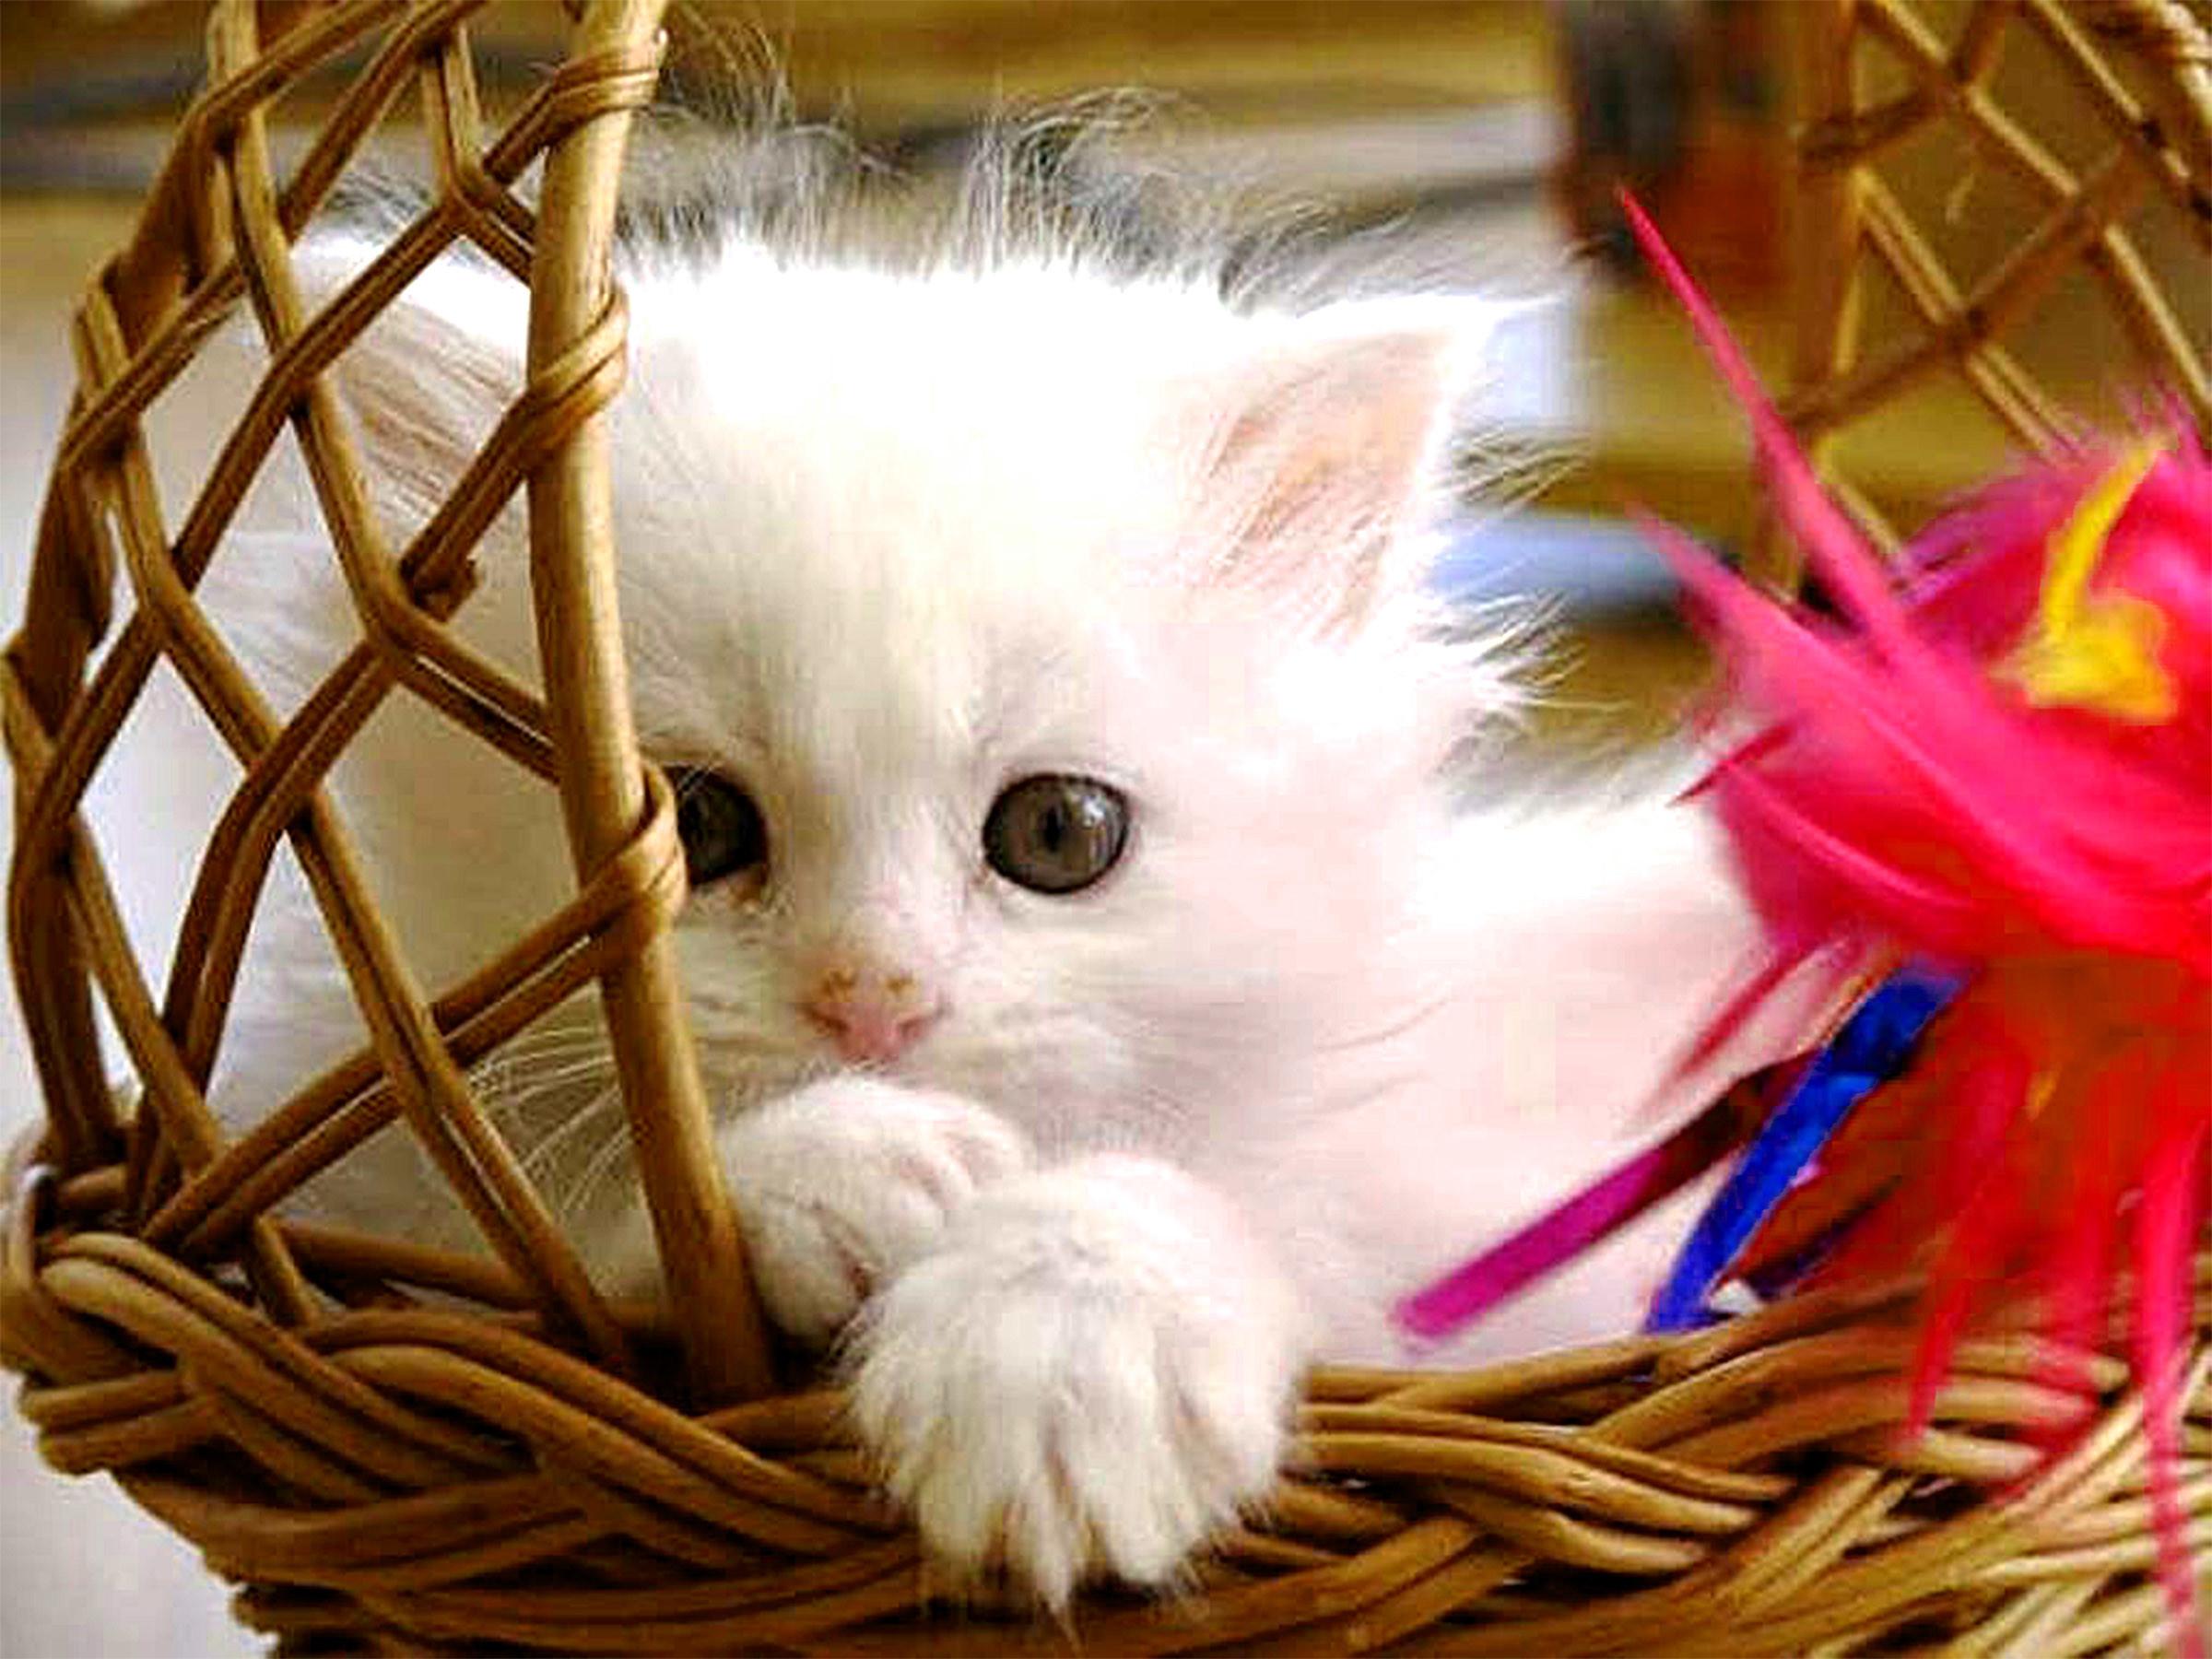 Baby Cat Wallpaper 59 images